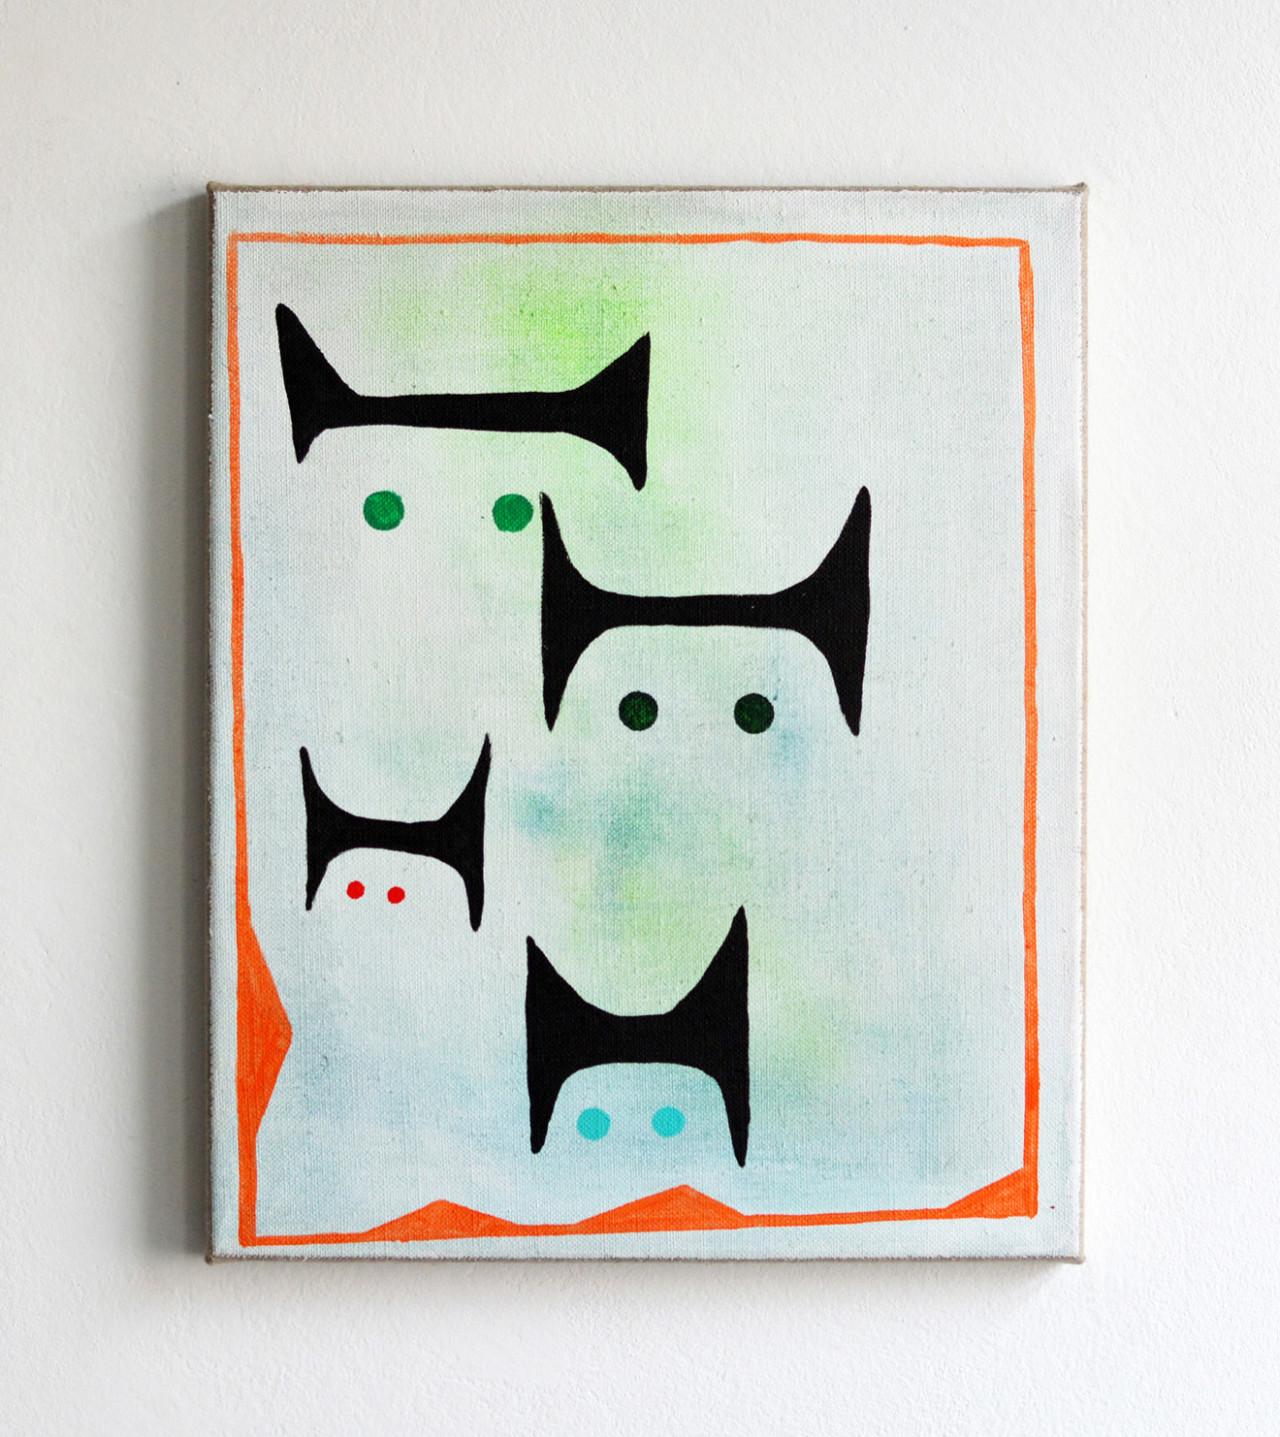 Ulrich Hakel Untitled